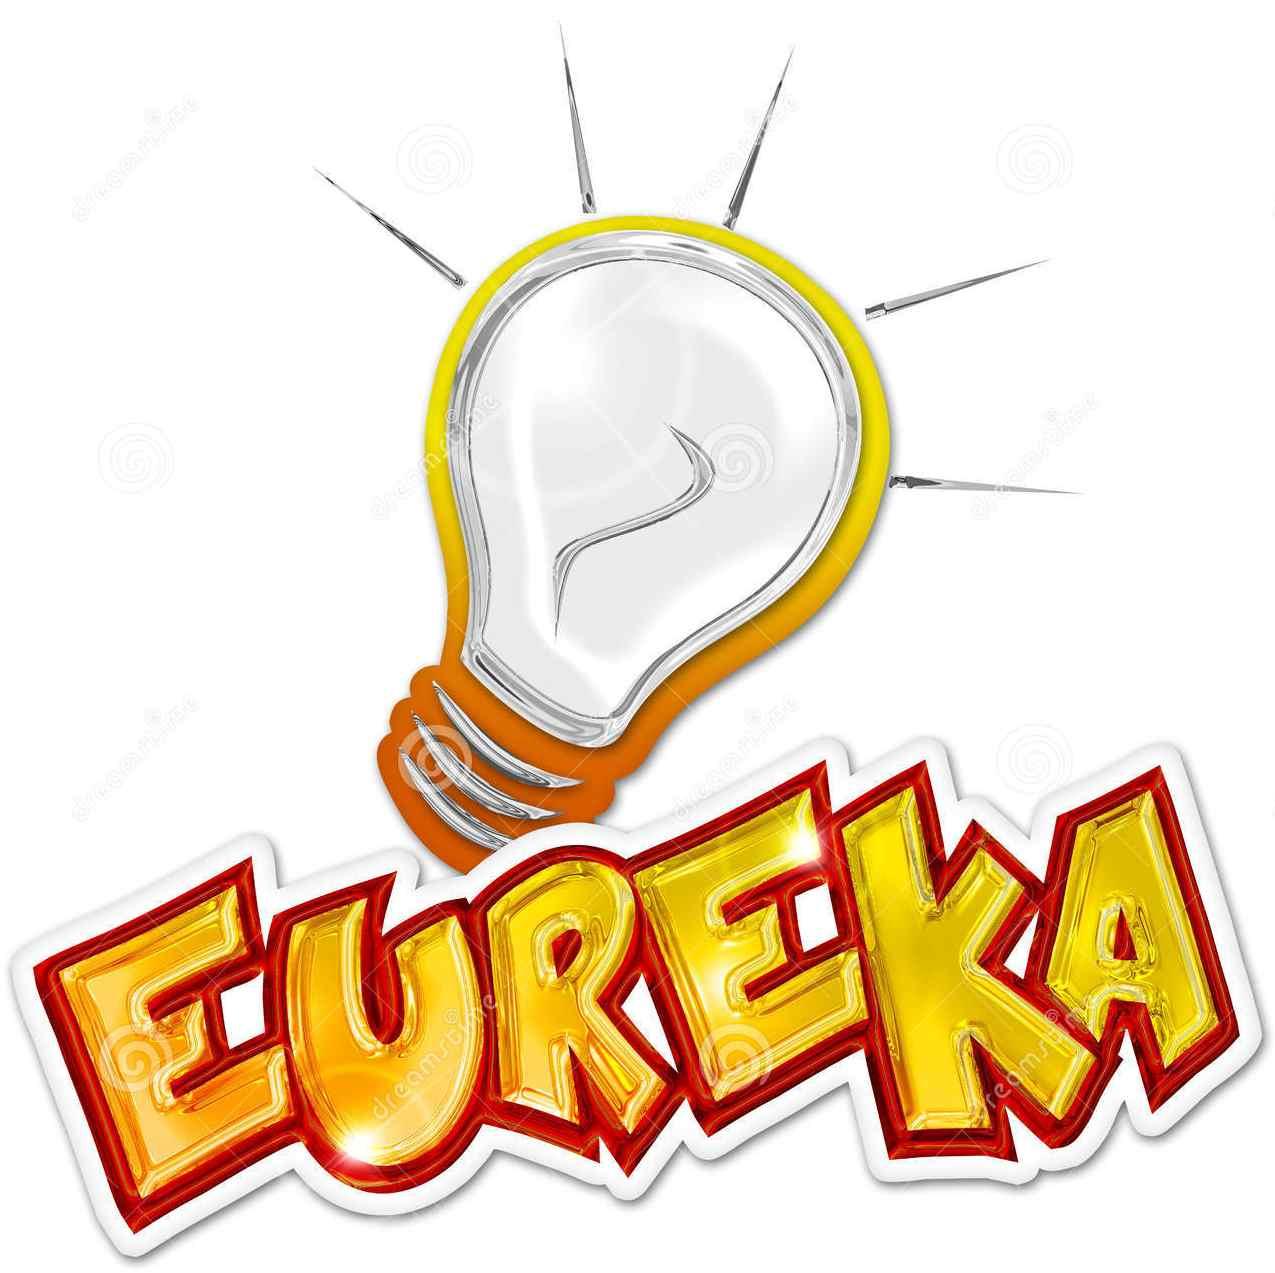 A eureka moment